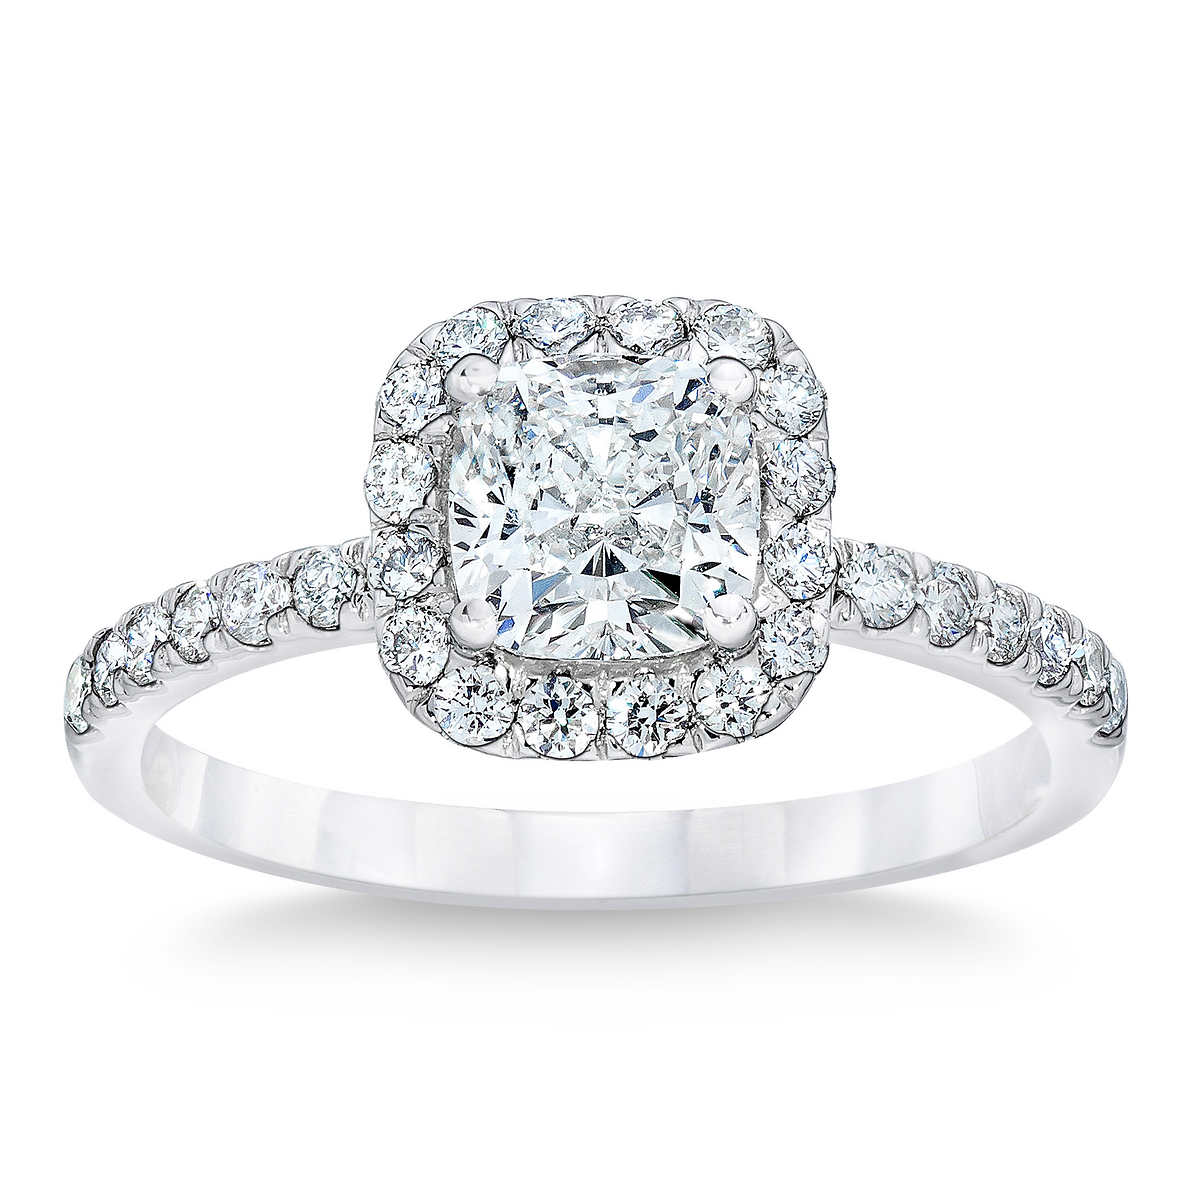 rings wedding ring Cushion Cut 2 55 ctw VS1 Clarity G Color Diamond Platinum Ring